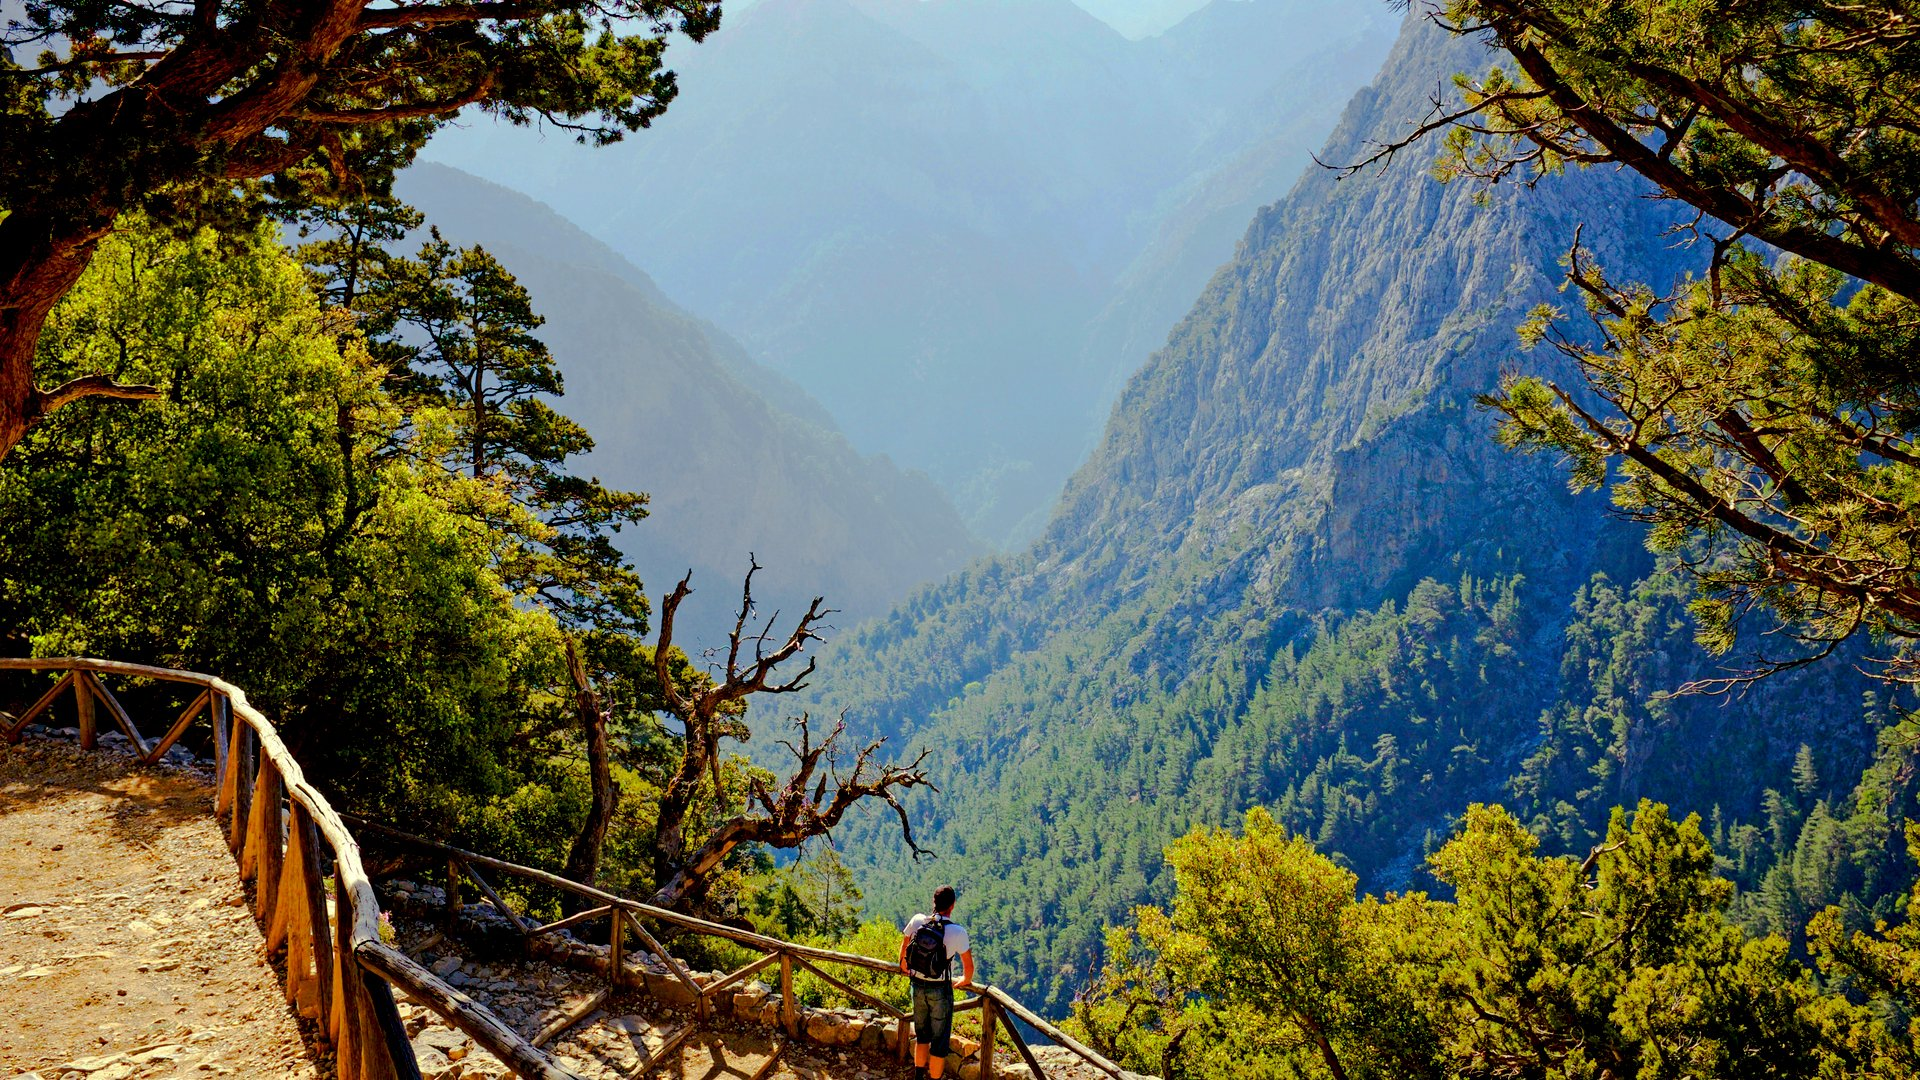 walking holidays in crete, Samaria Gorge and Mount Pachnes, samaria gorge, crete west coast, mount pachnes